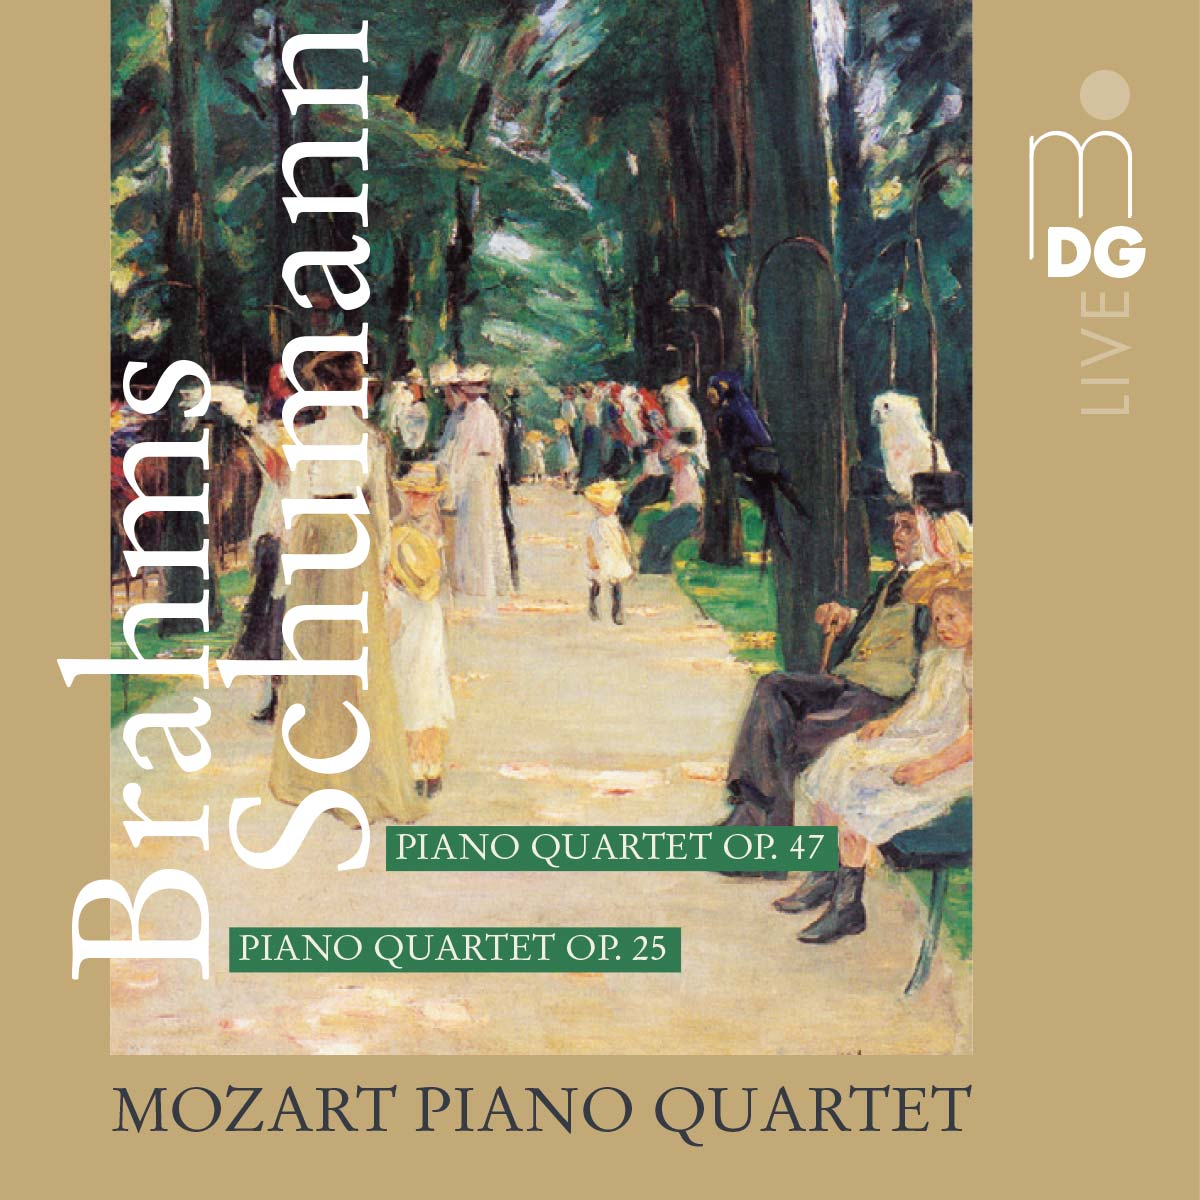 CD Mozart Piano Quartet - Brahms Schumann